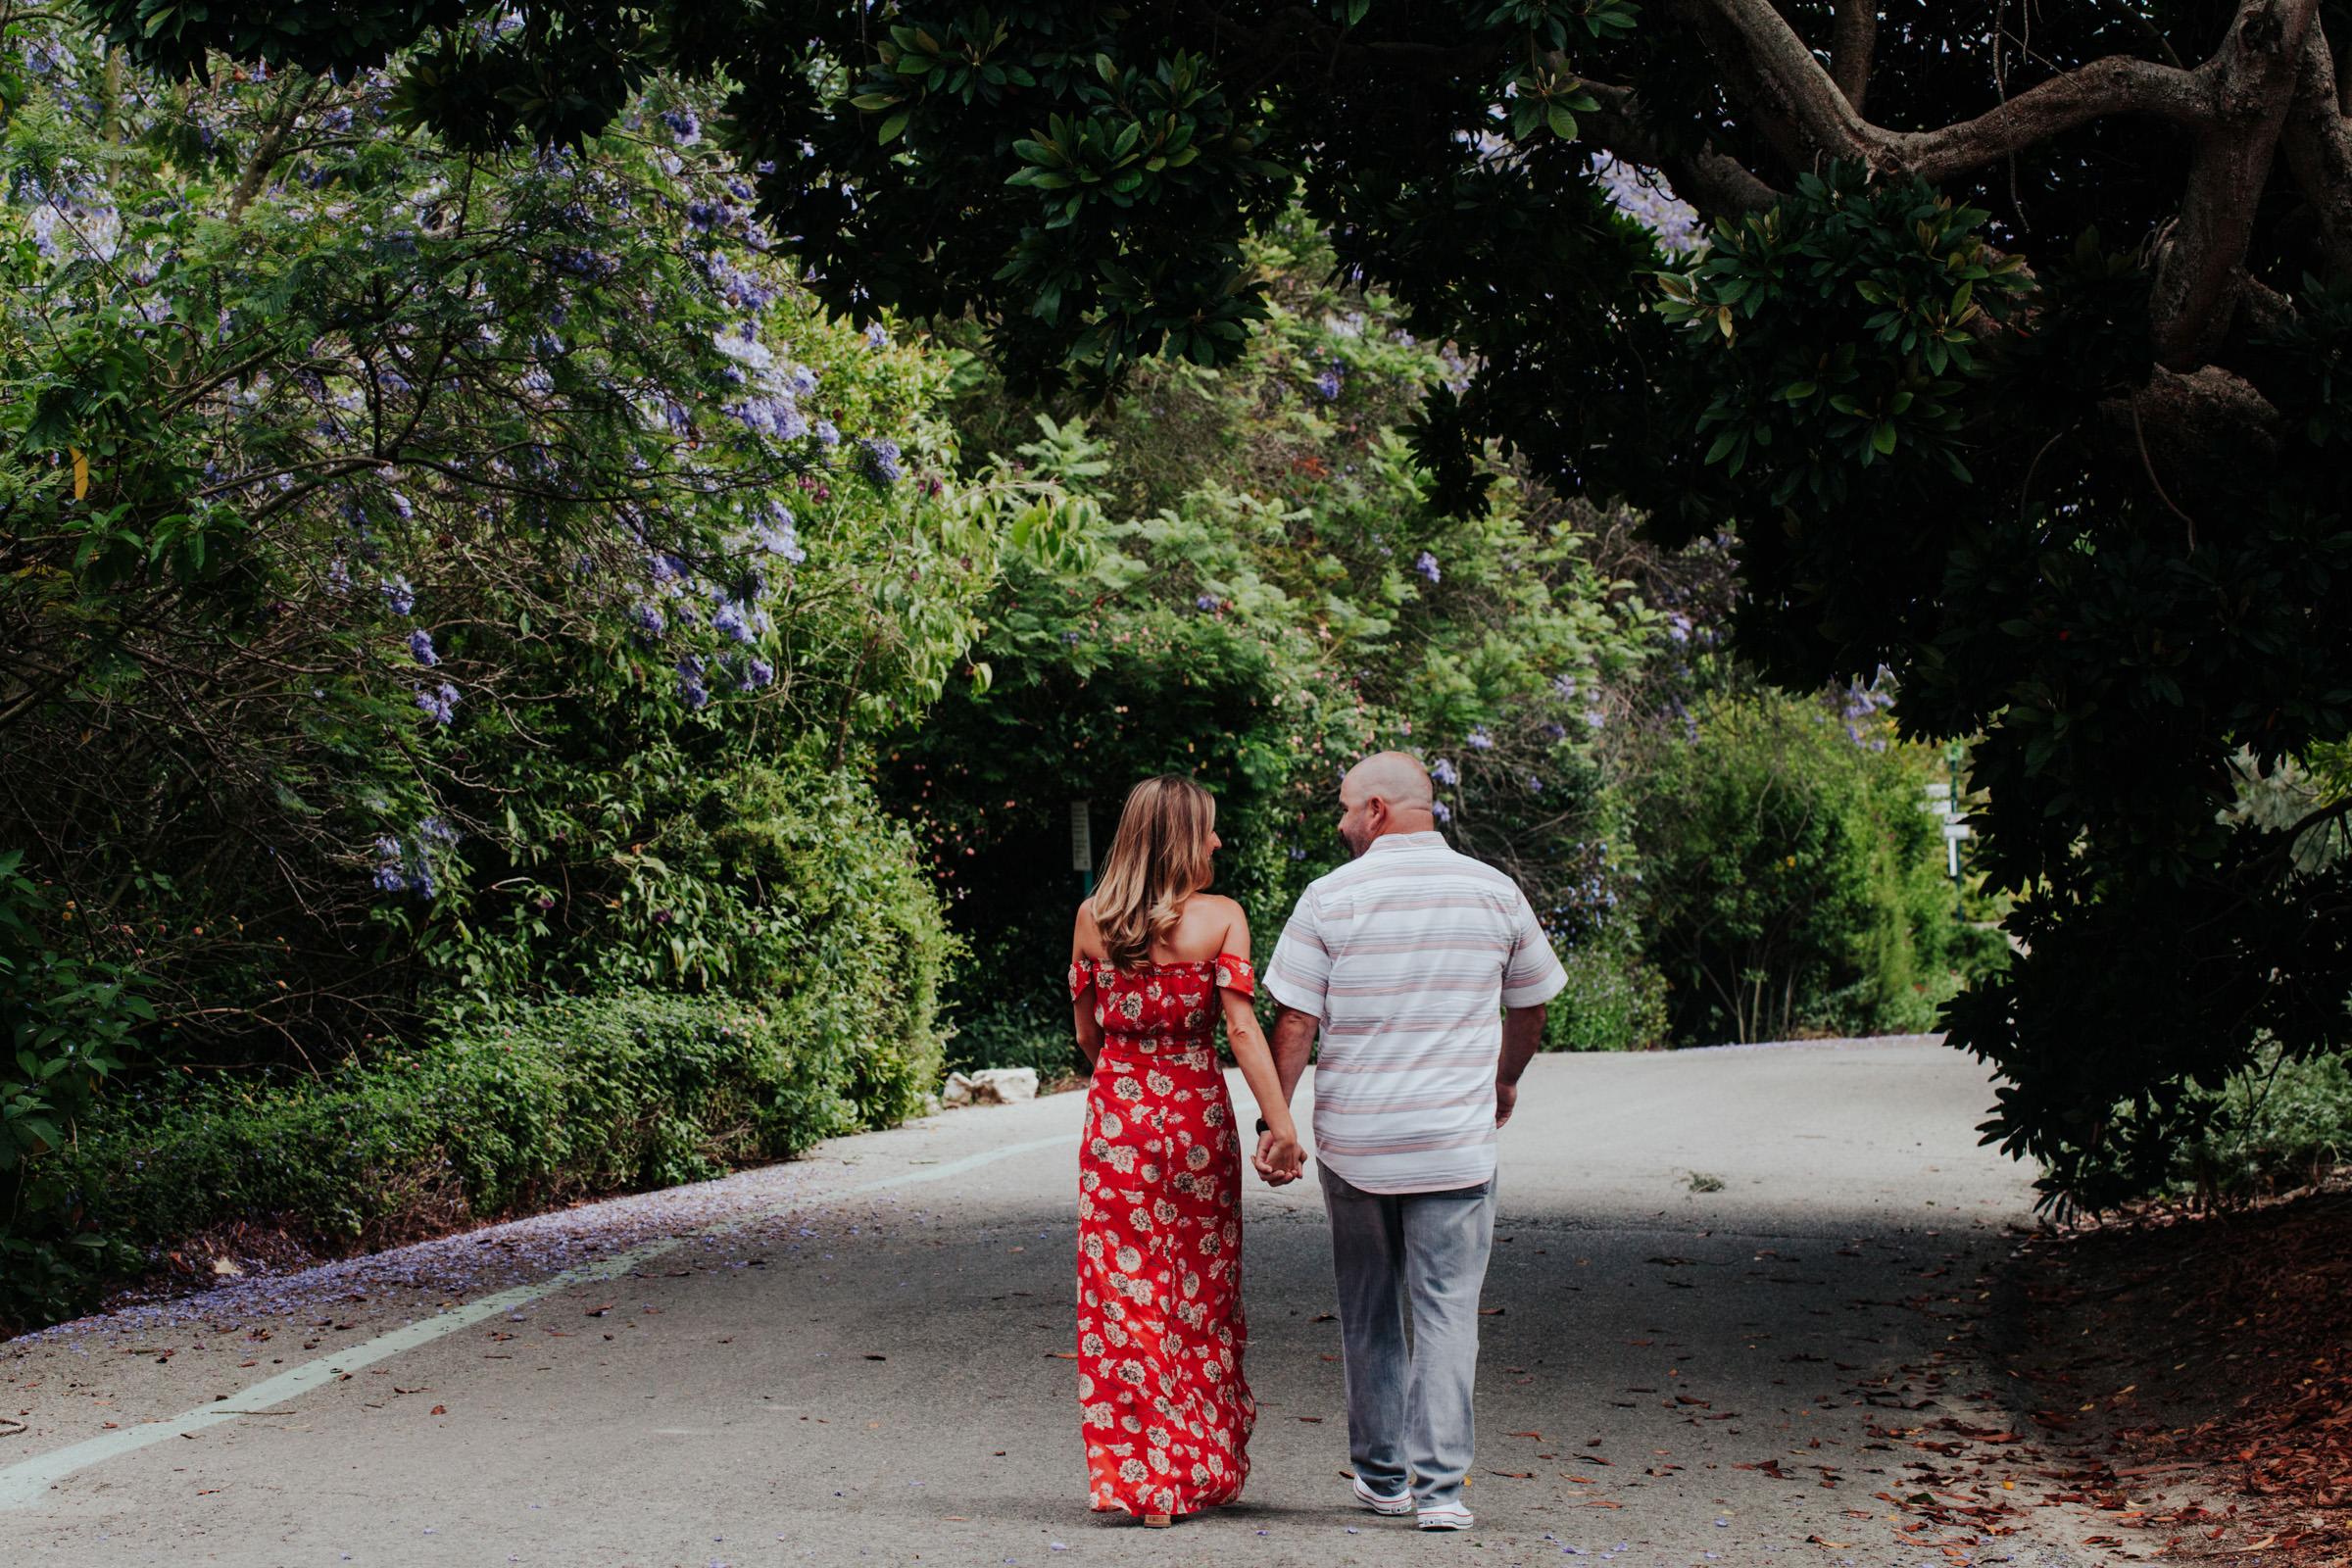 terranea-resort-palos-verdes-california-wedding-photography-cove-los-angeles-pierce-48.jpg